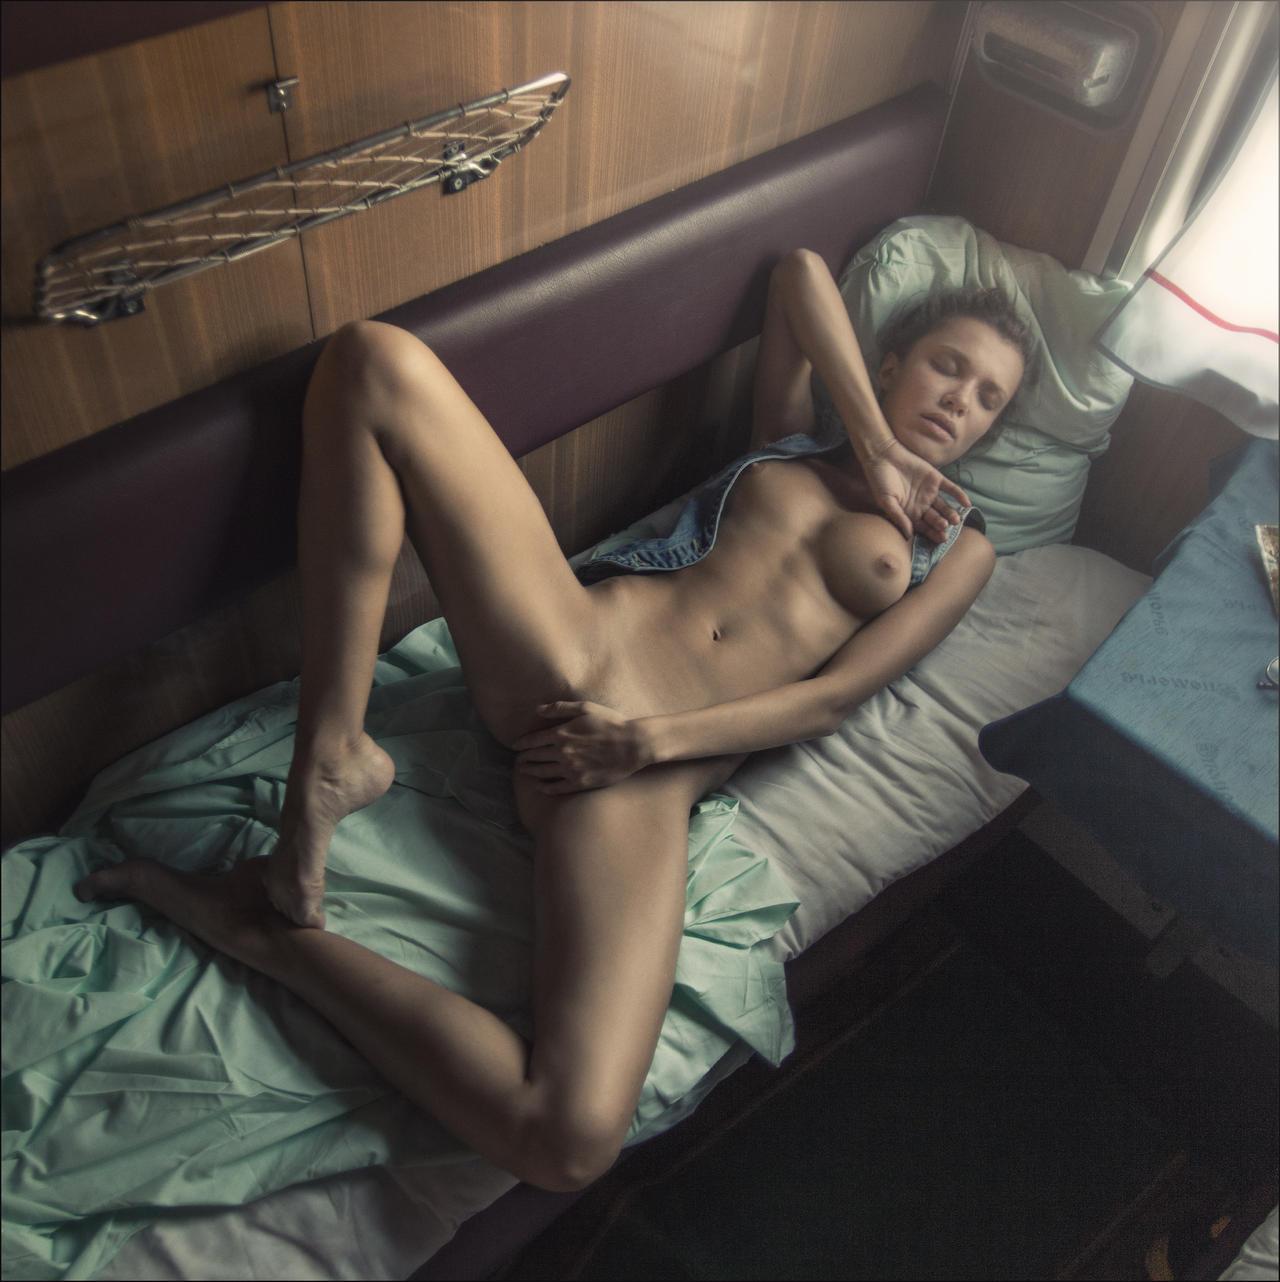 veer-eroticheskiy-kupit